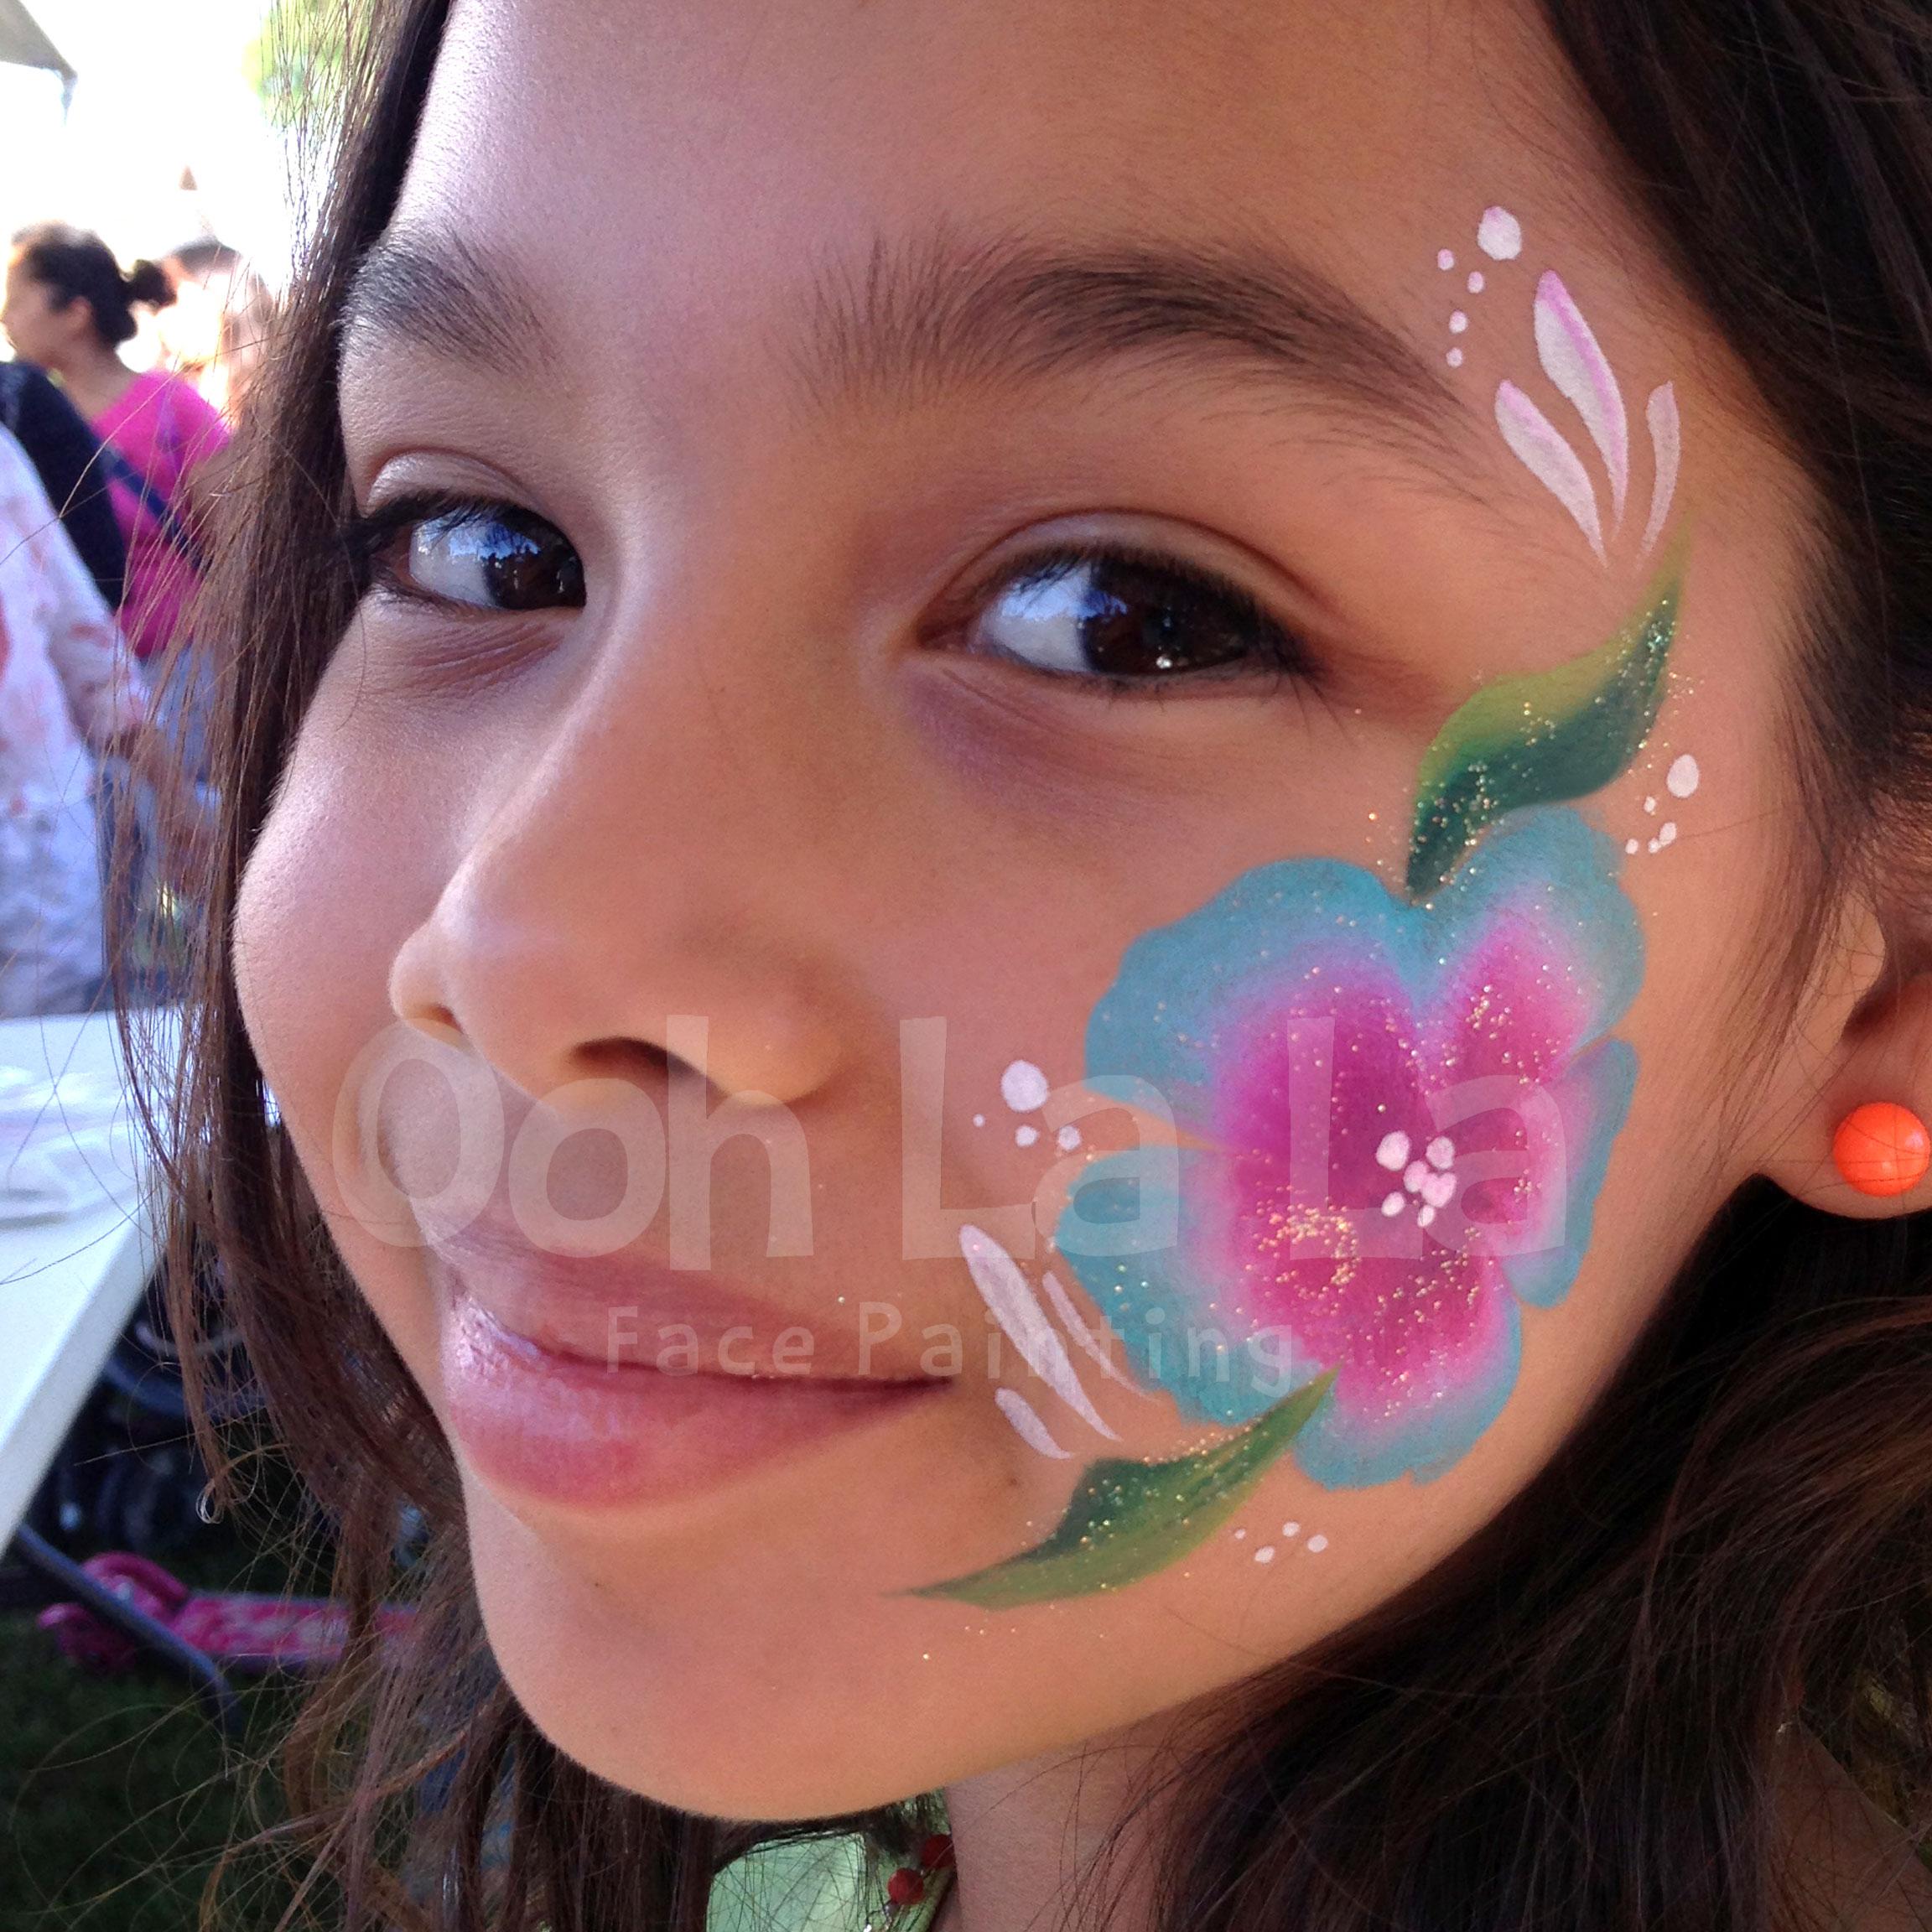 Ooh-LaLa-face-painting-flower.jpg